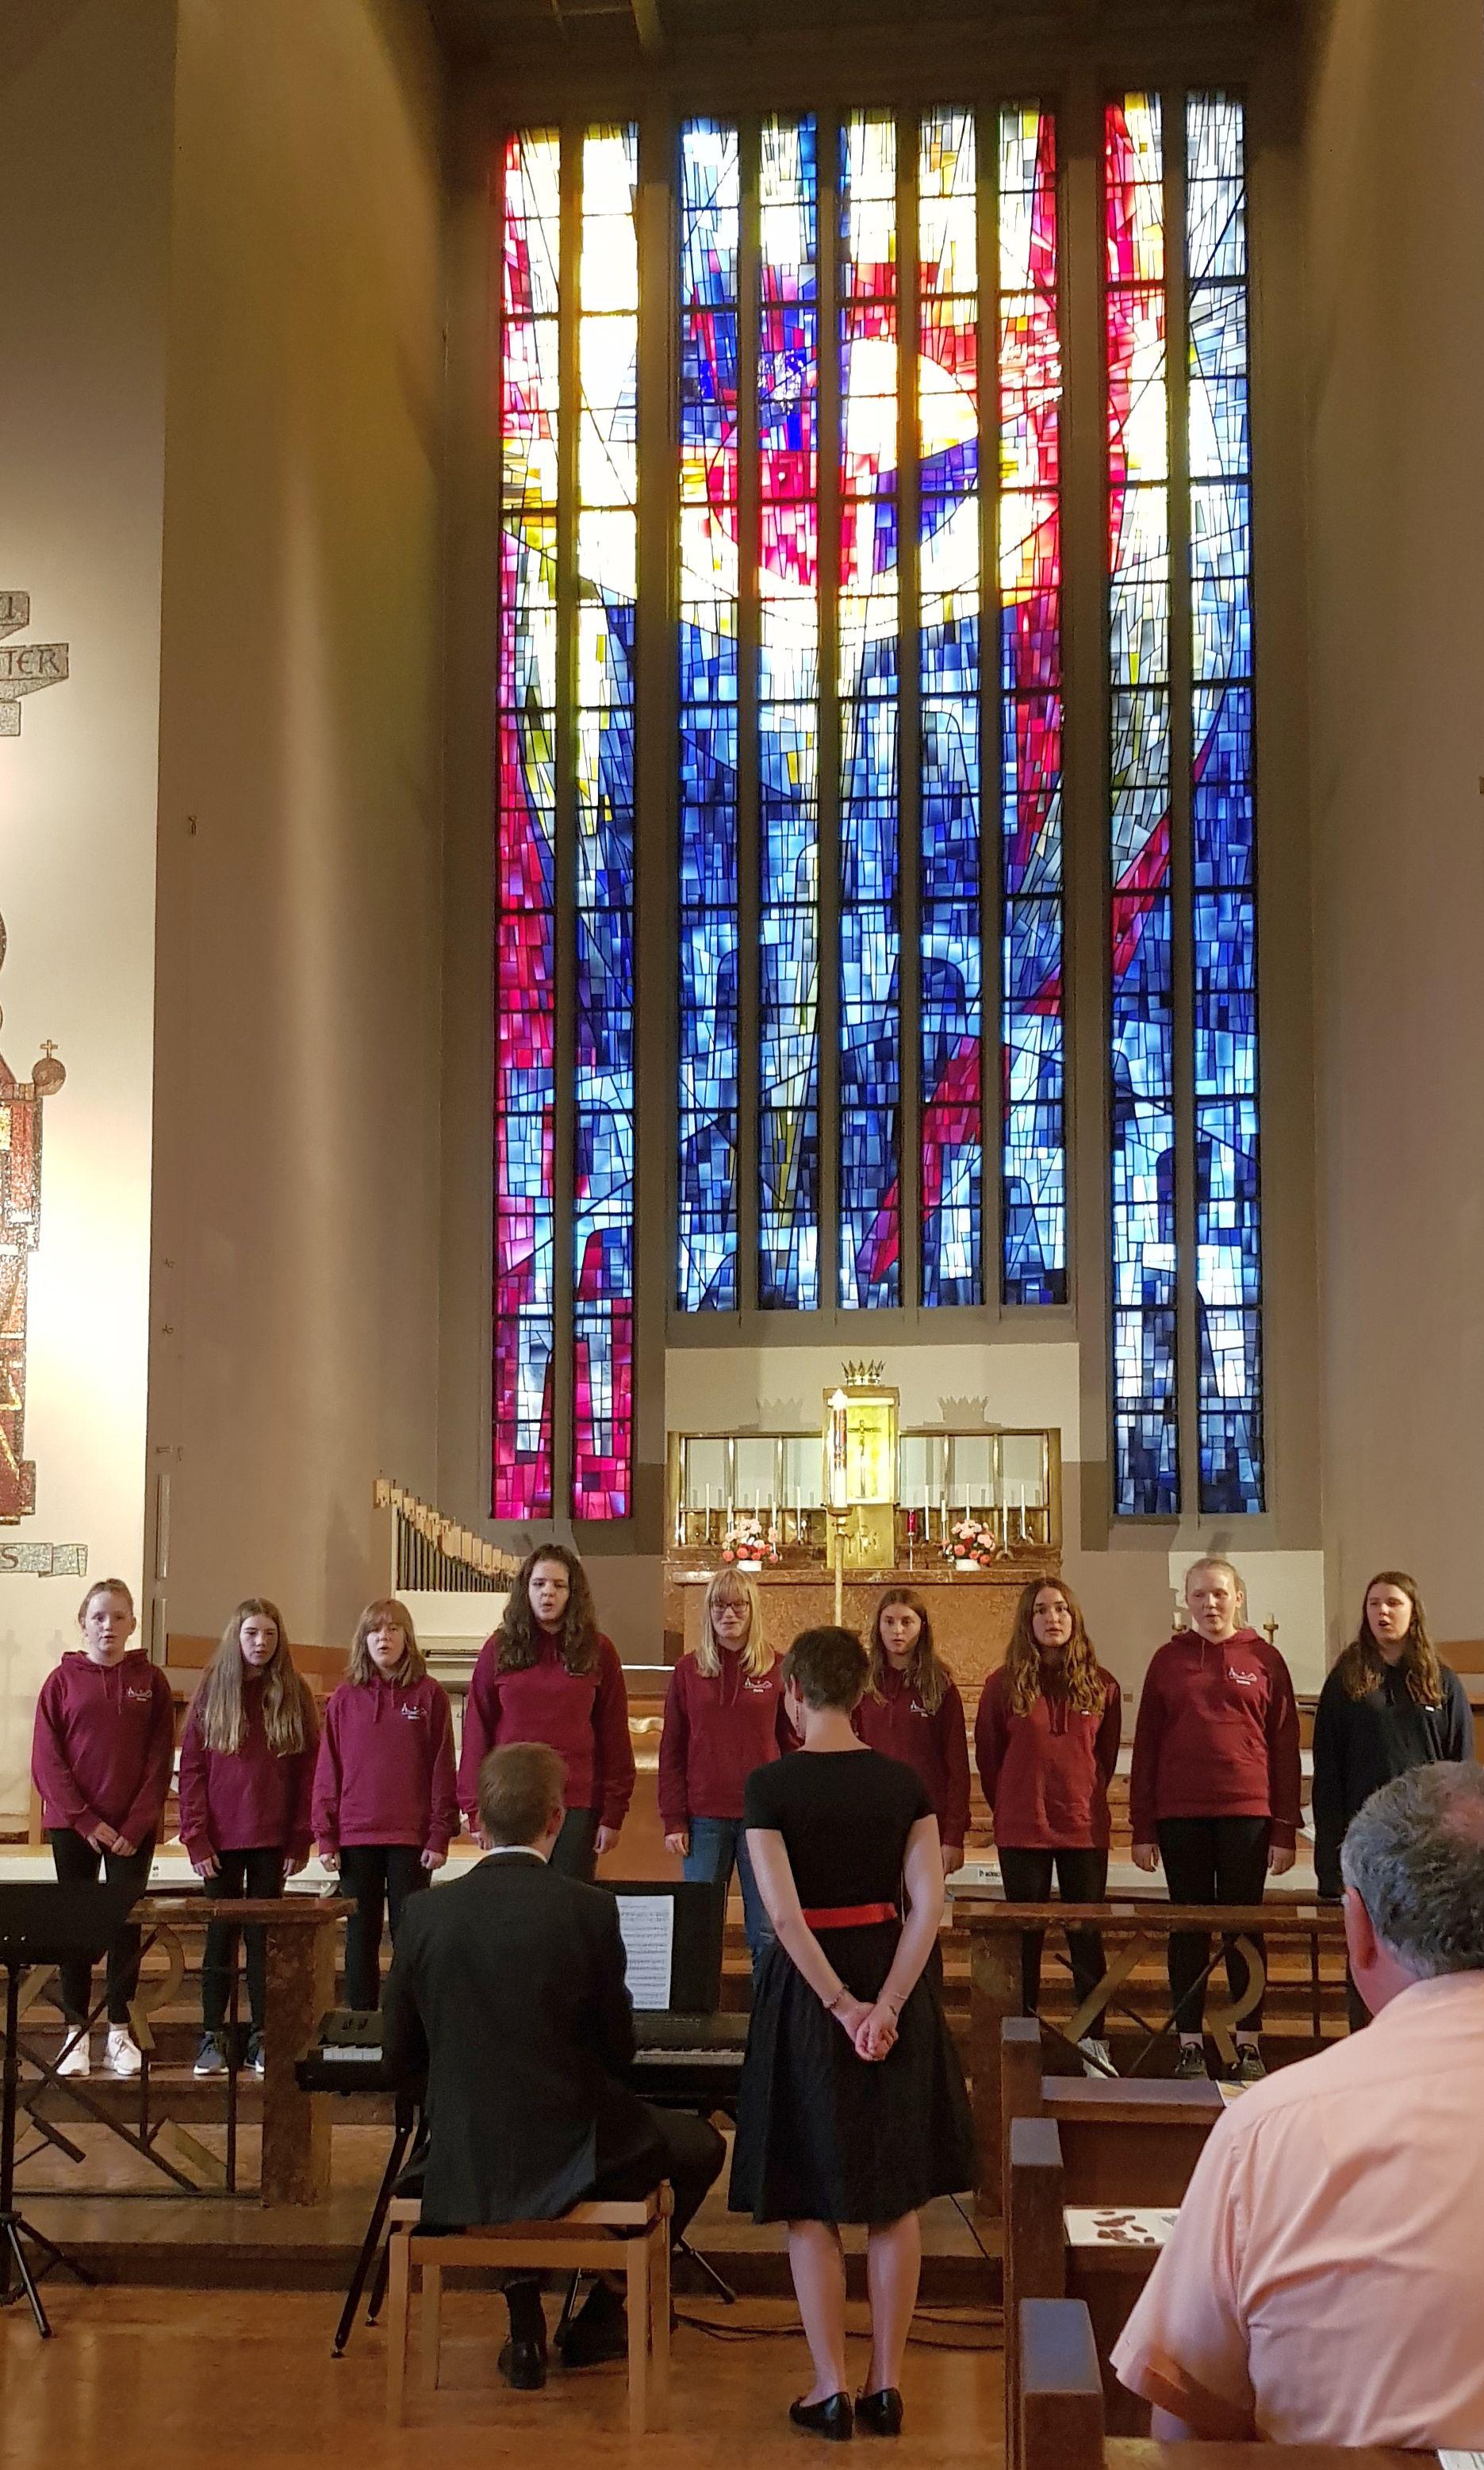 Chor Apostelsingers